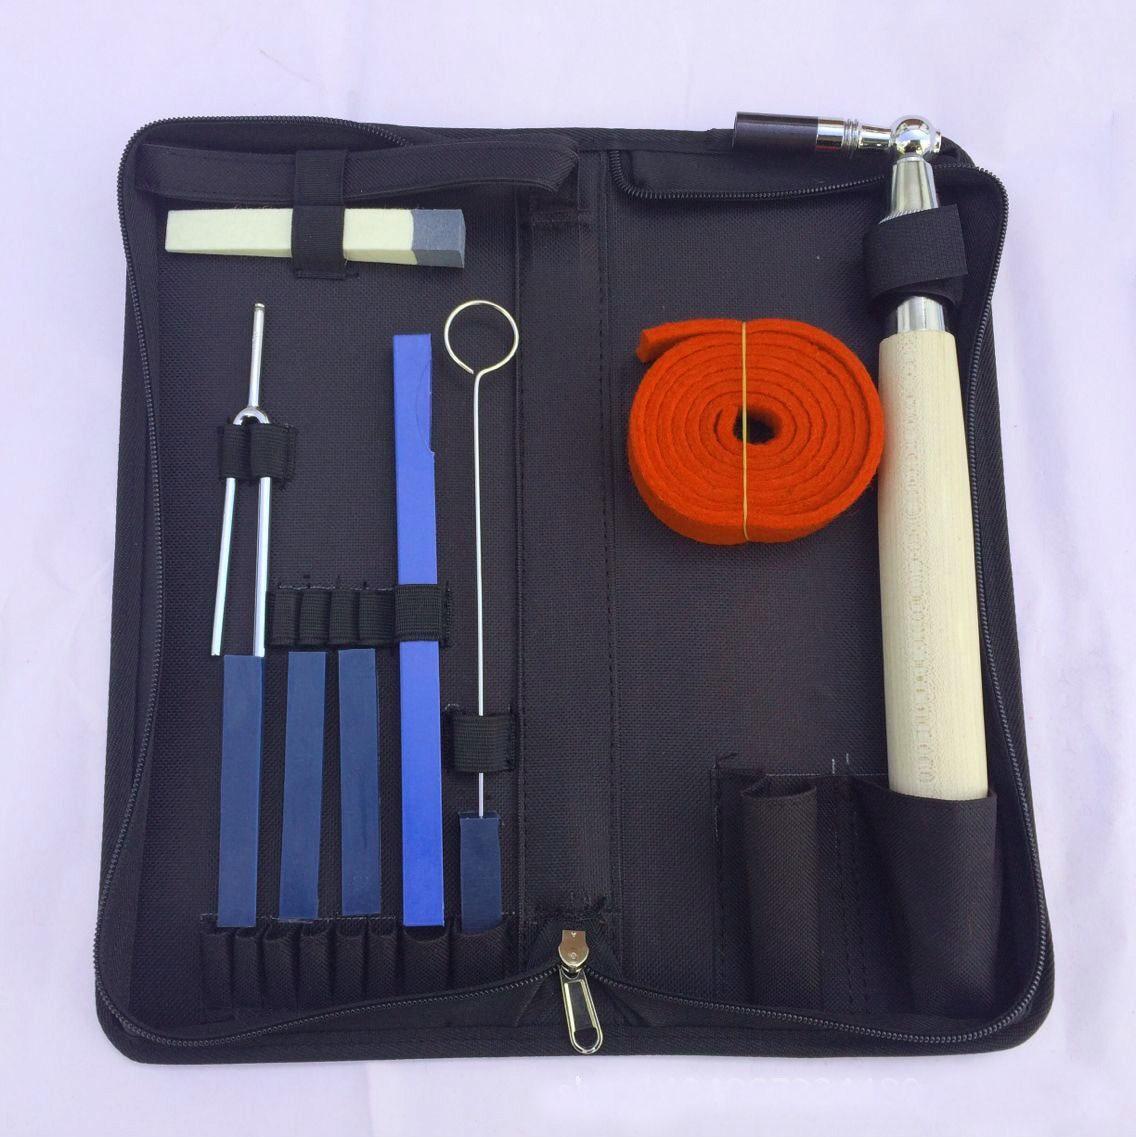 10 PCS/Set Of Piano Repair Tuning Tools Set Tone Tuning Wrench Kit Musical Instrument Accessories musical instrument repair tools for saxophone flute clarinet repair